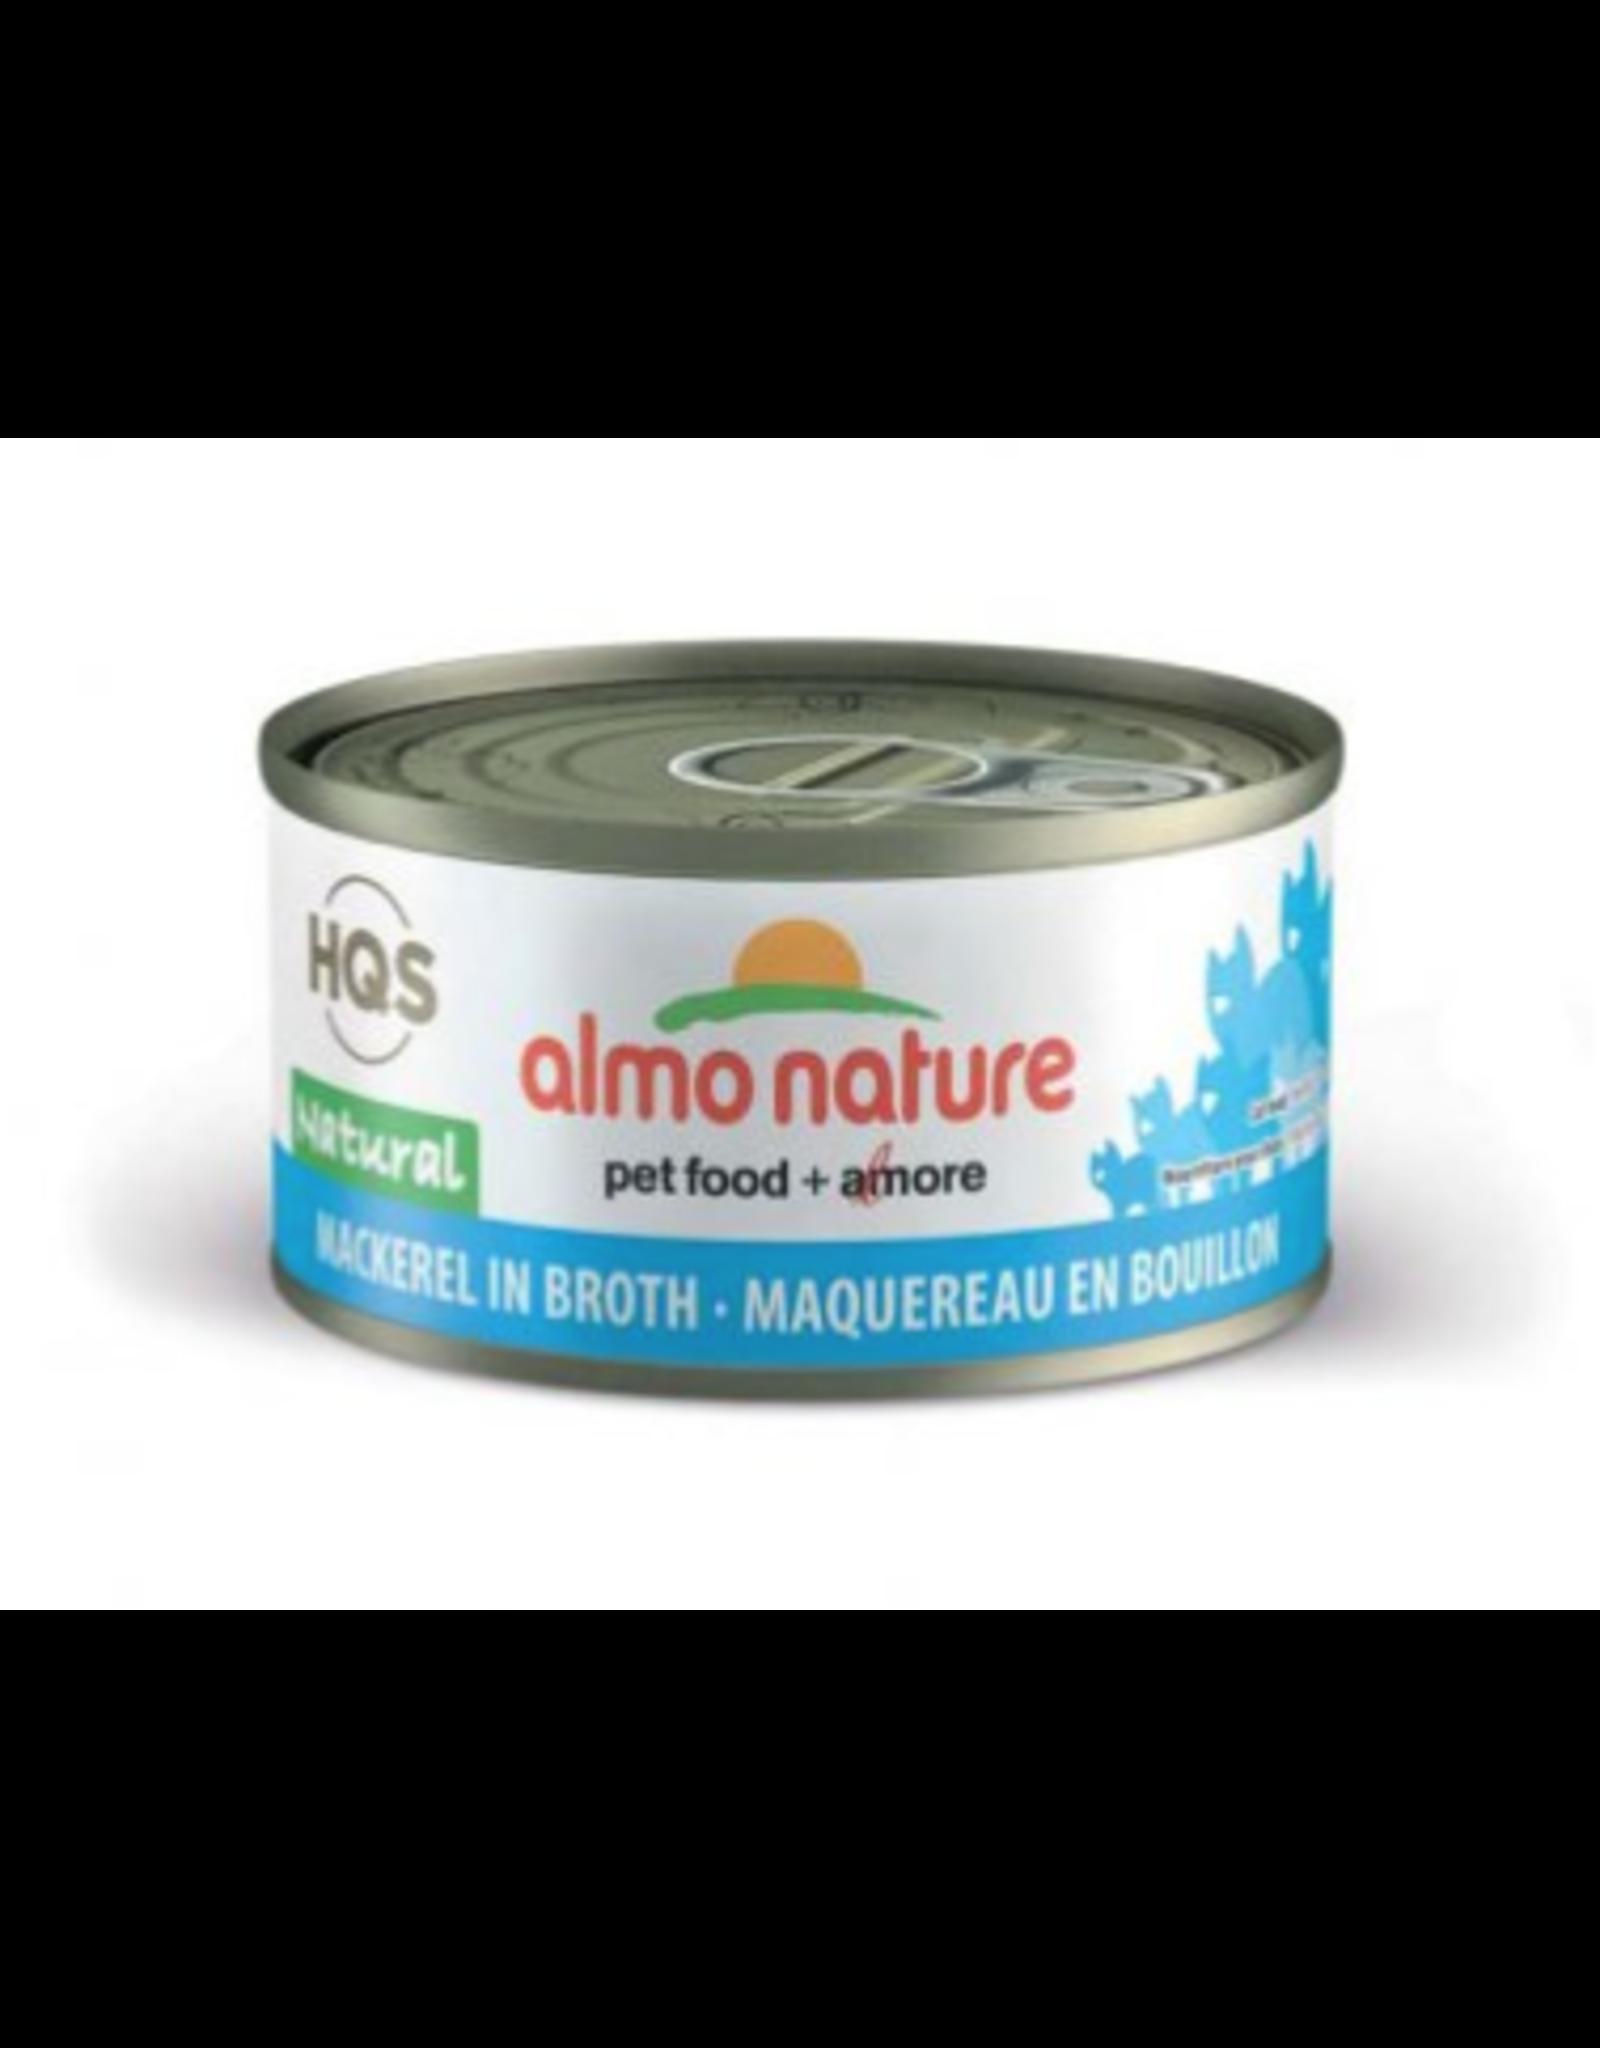 Almo Nature Almo Nature HQS Natural Mackerel in Broth Cat Food 2.47 Oz